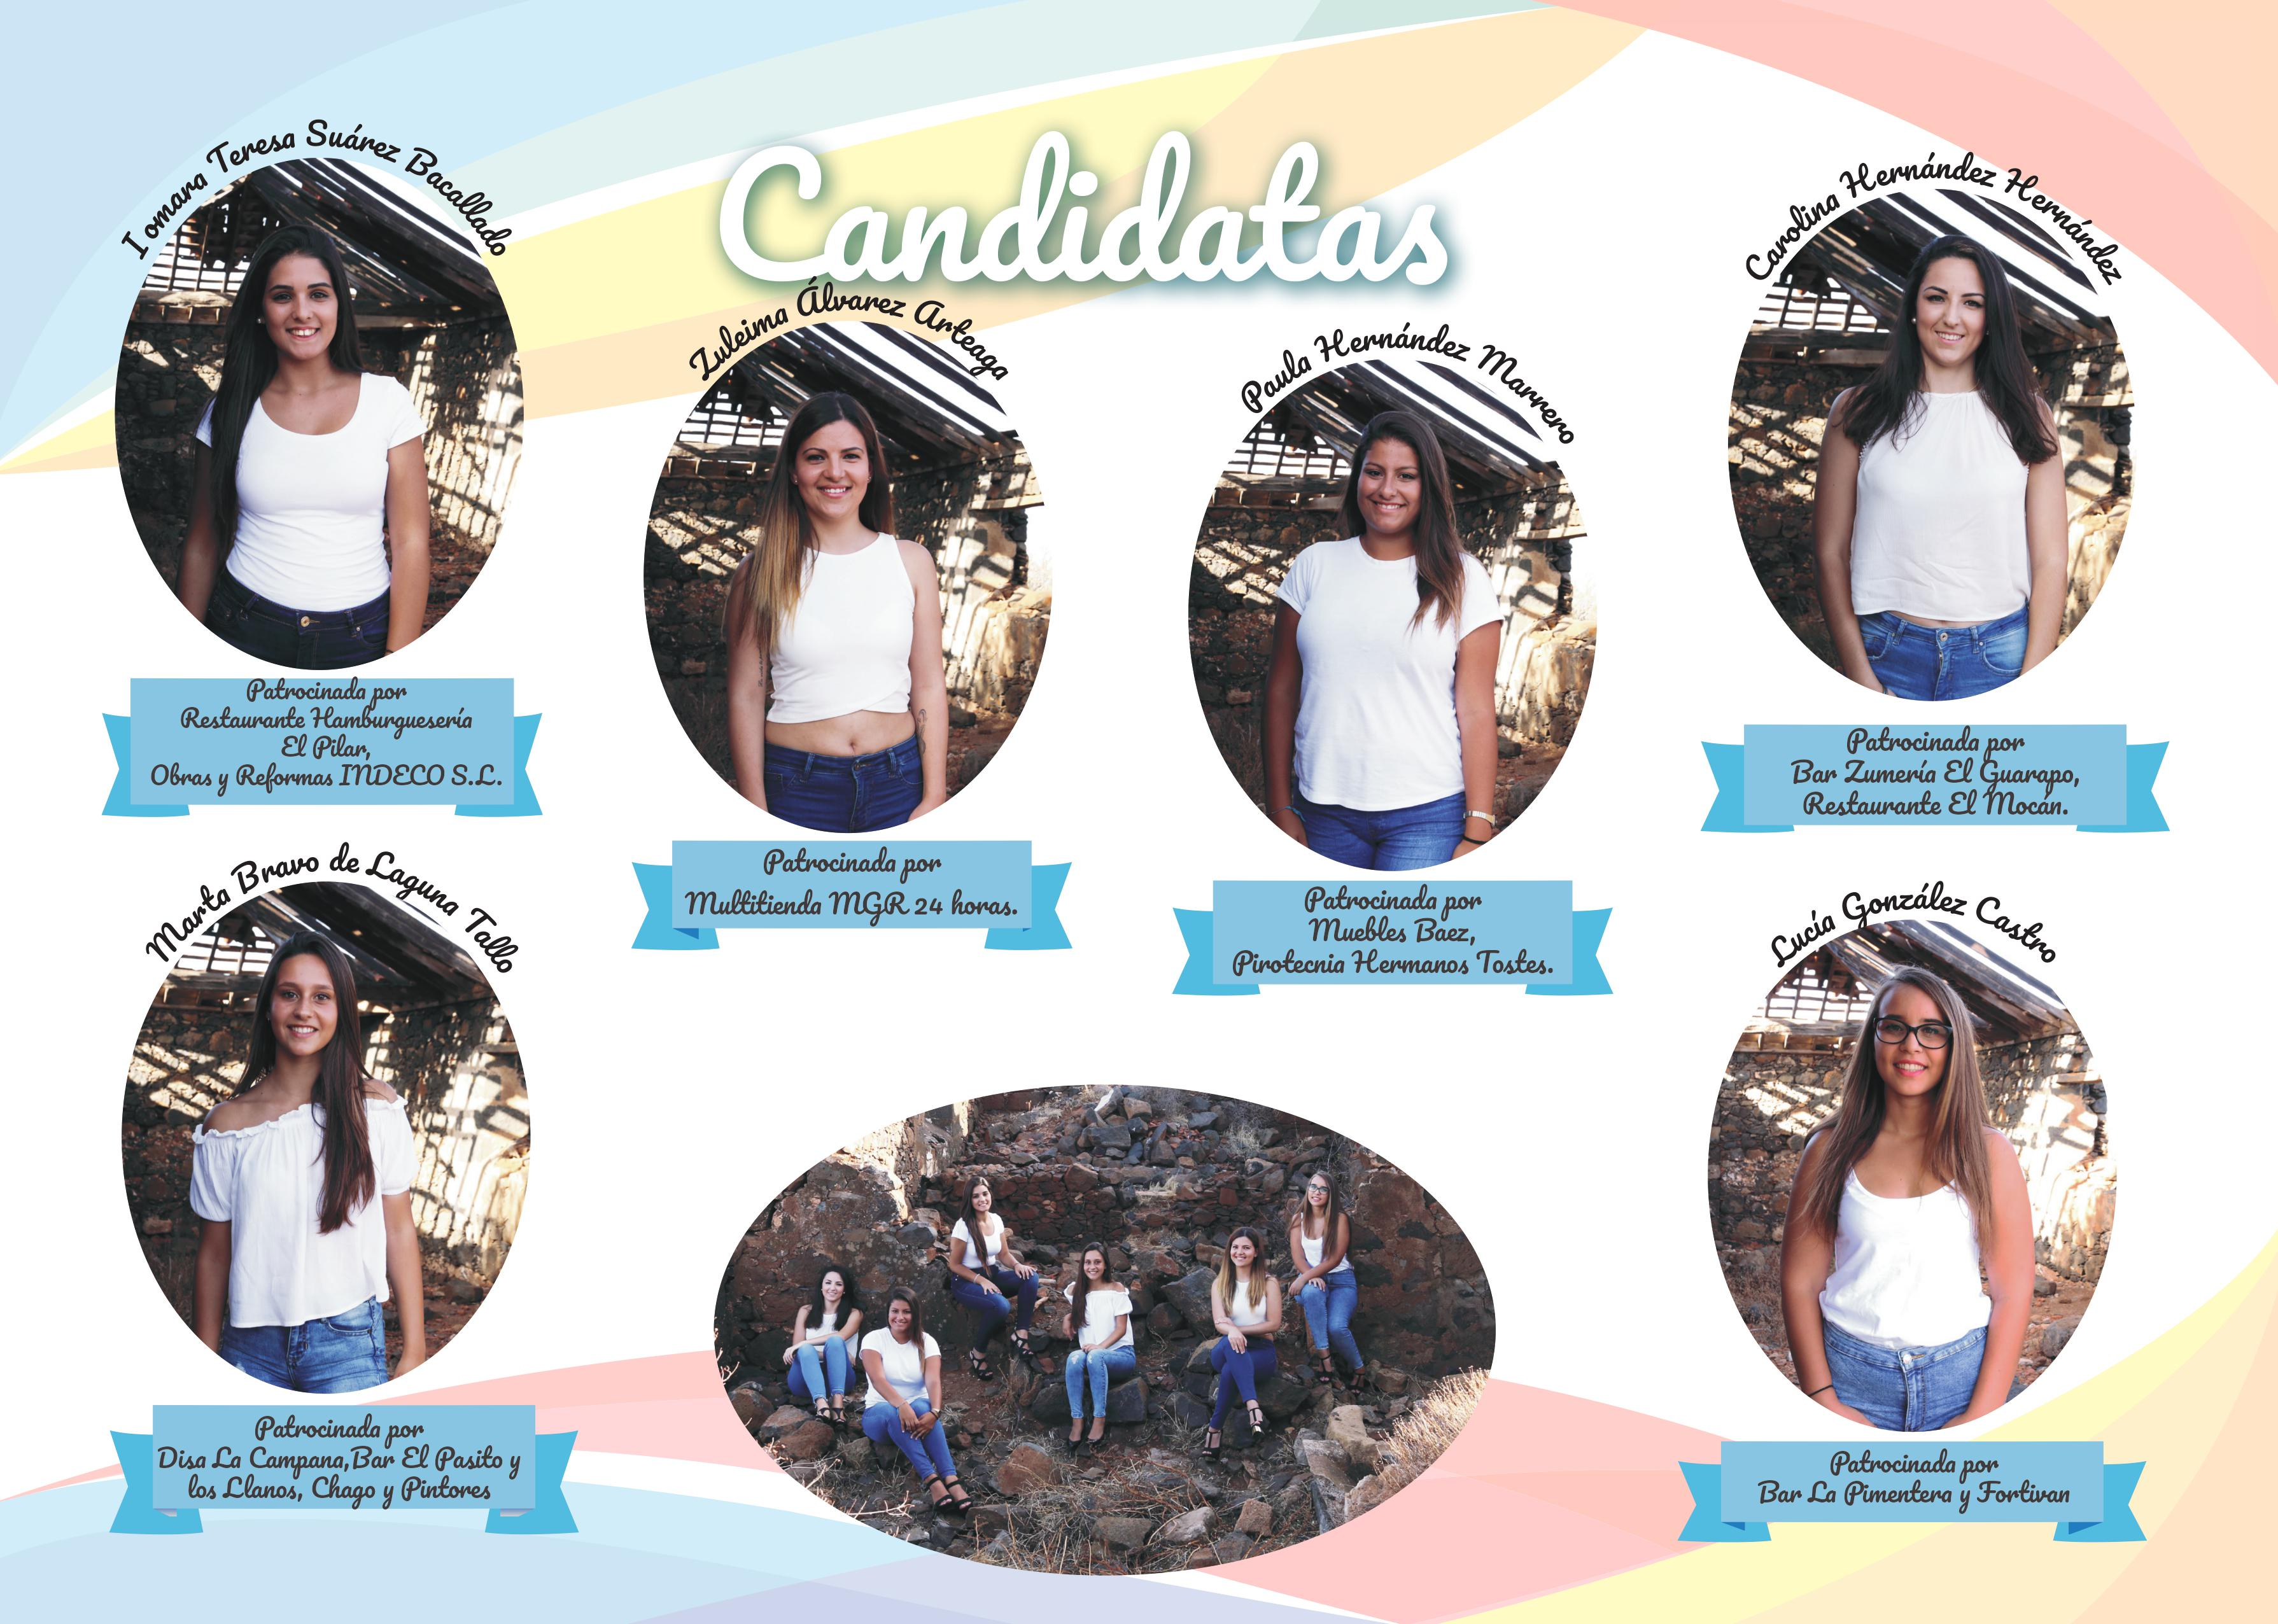 Candidatas Machado 2017 (1)